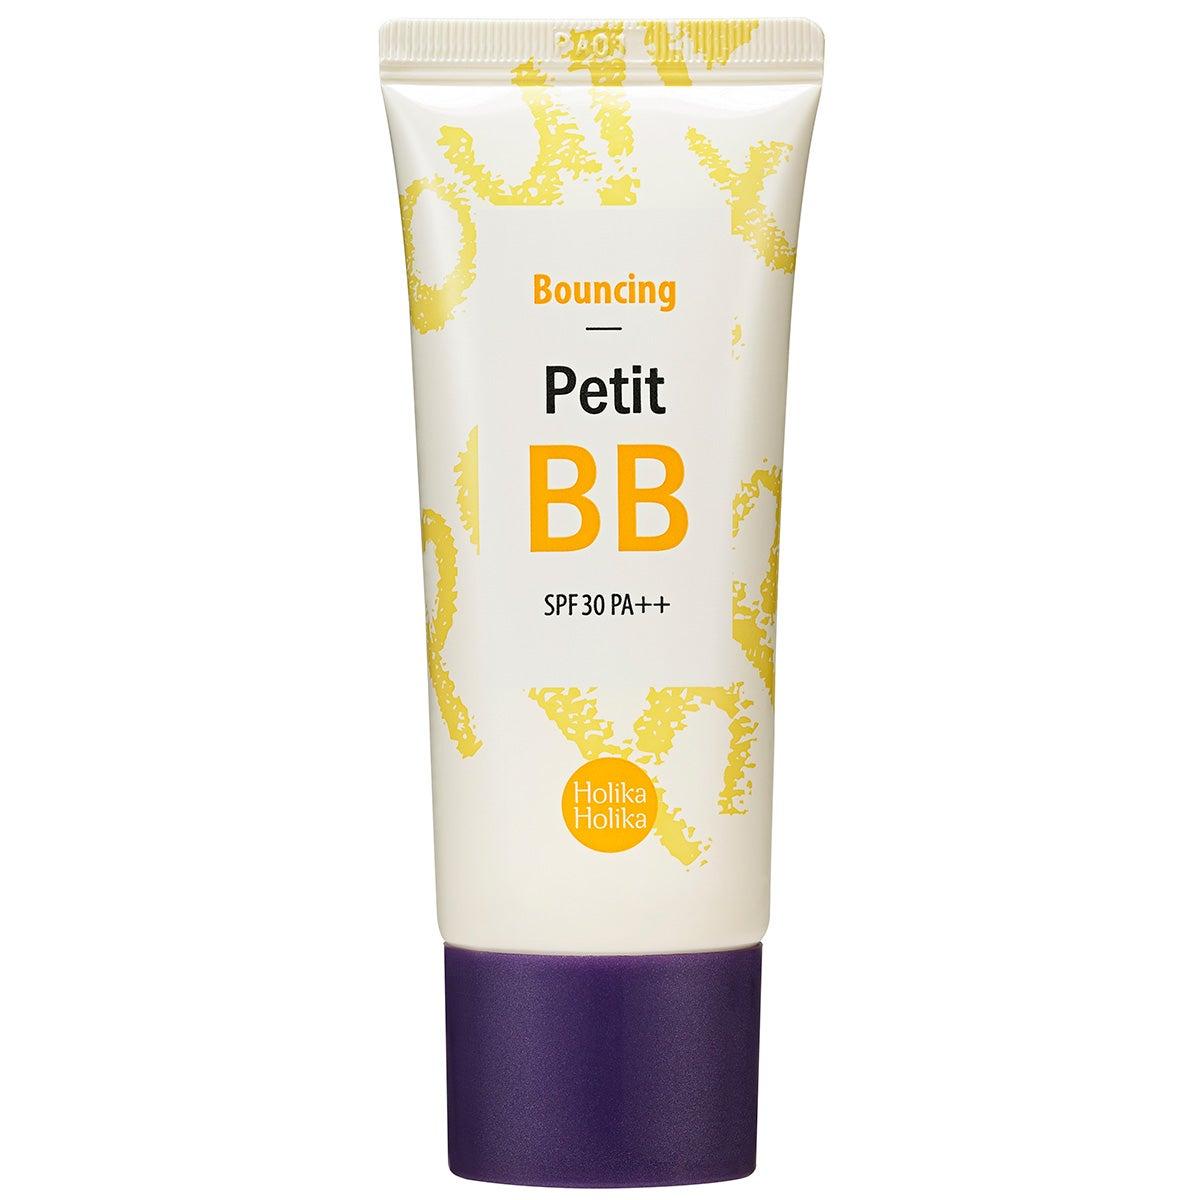 Bouncing Petit BB Cream 30 ml Holika Holika K-Beauty